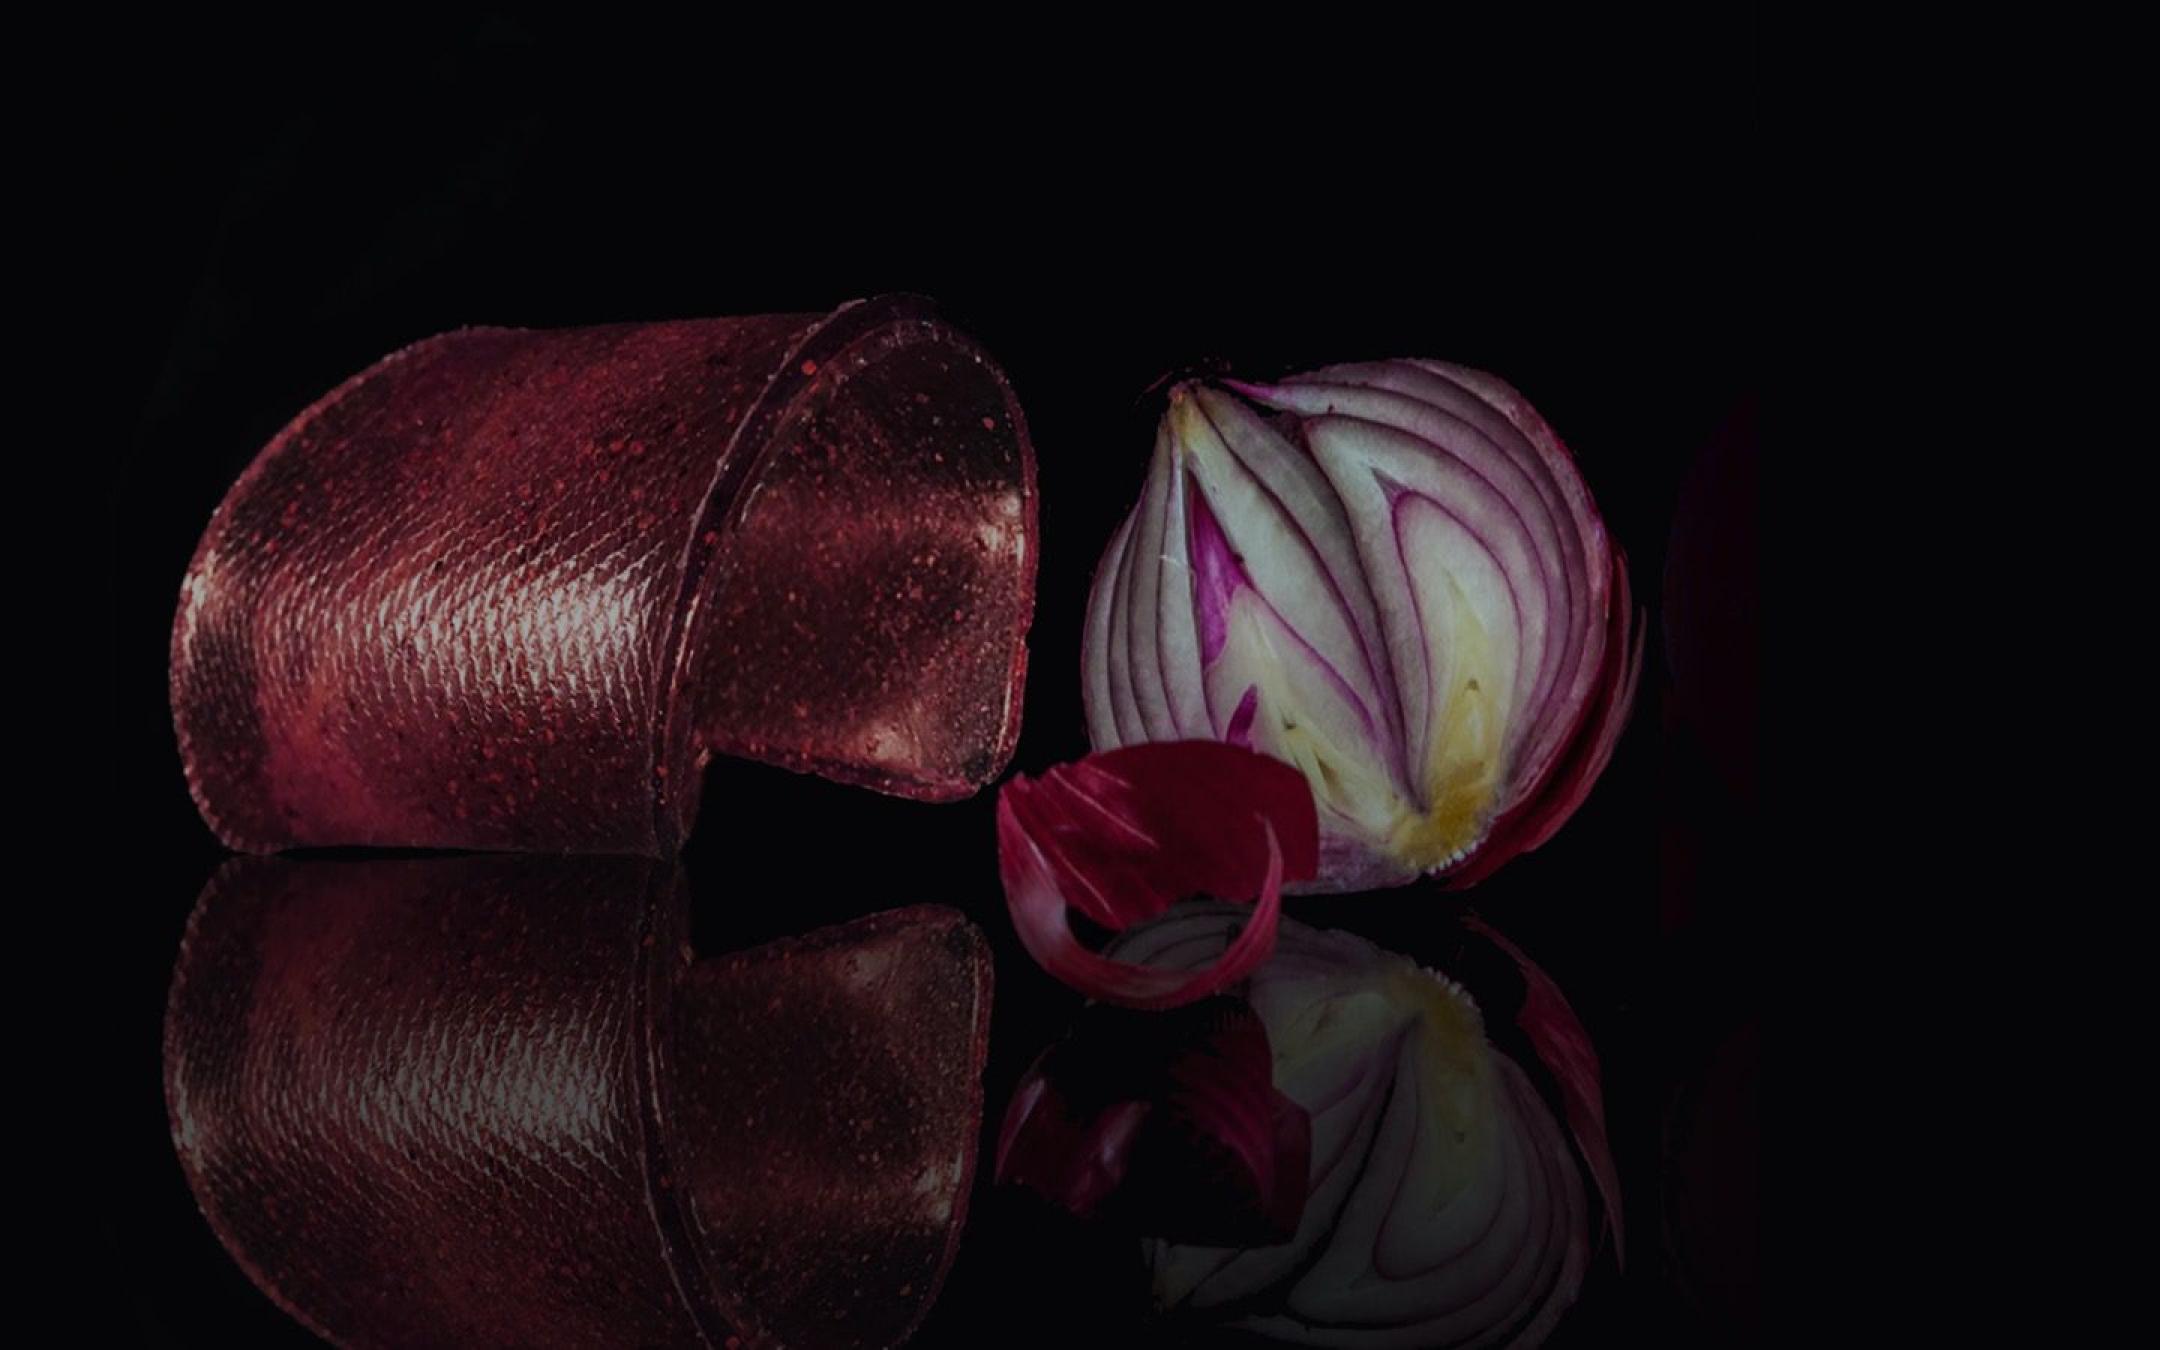 Onion bio leather